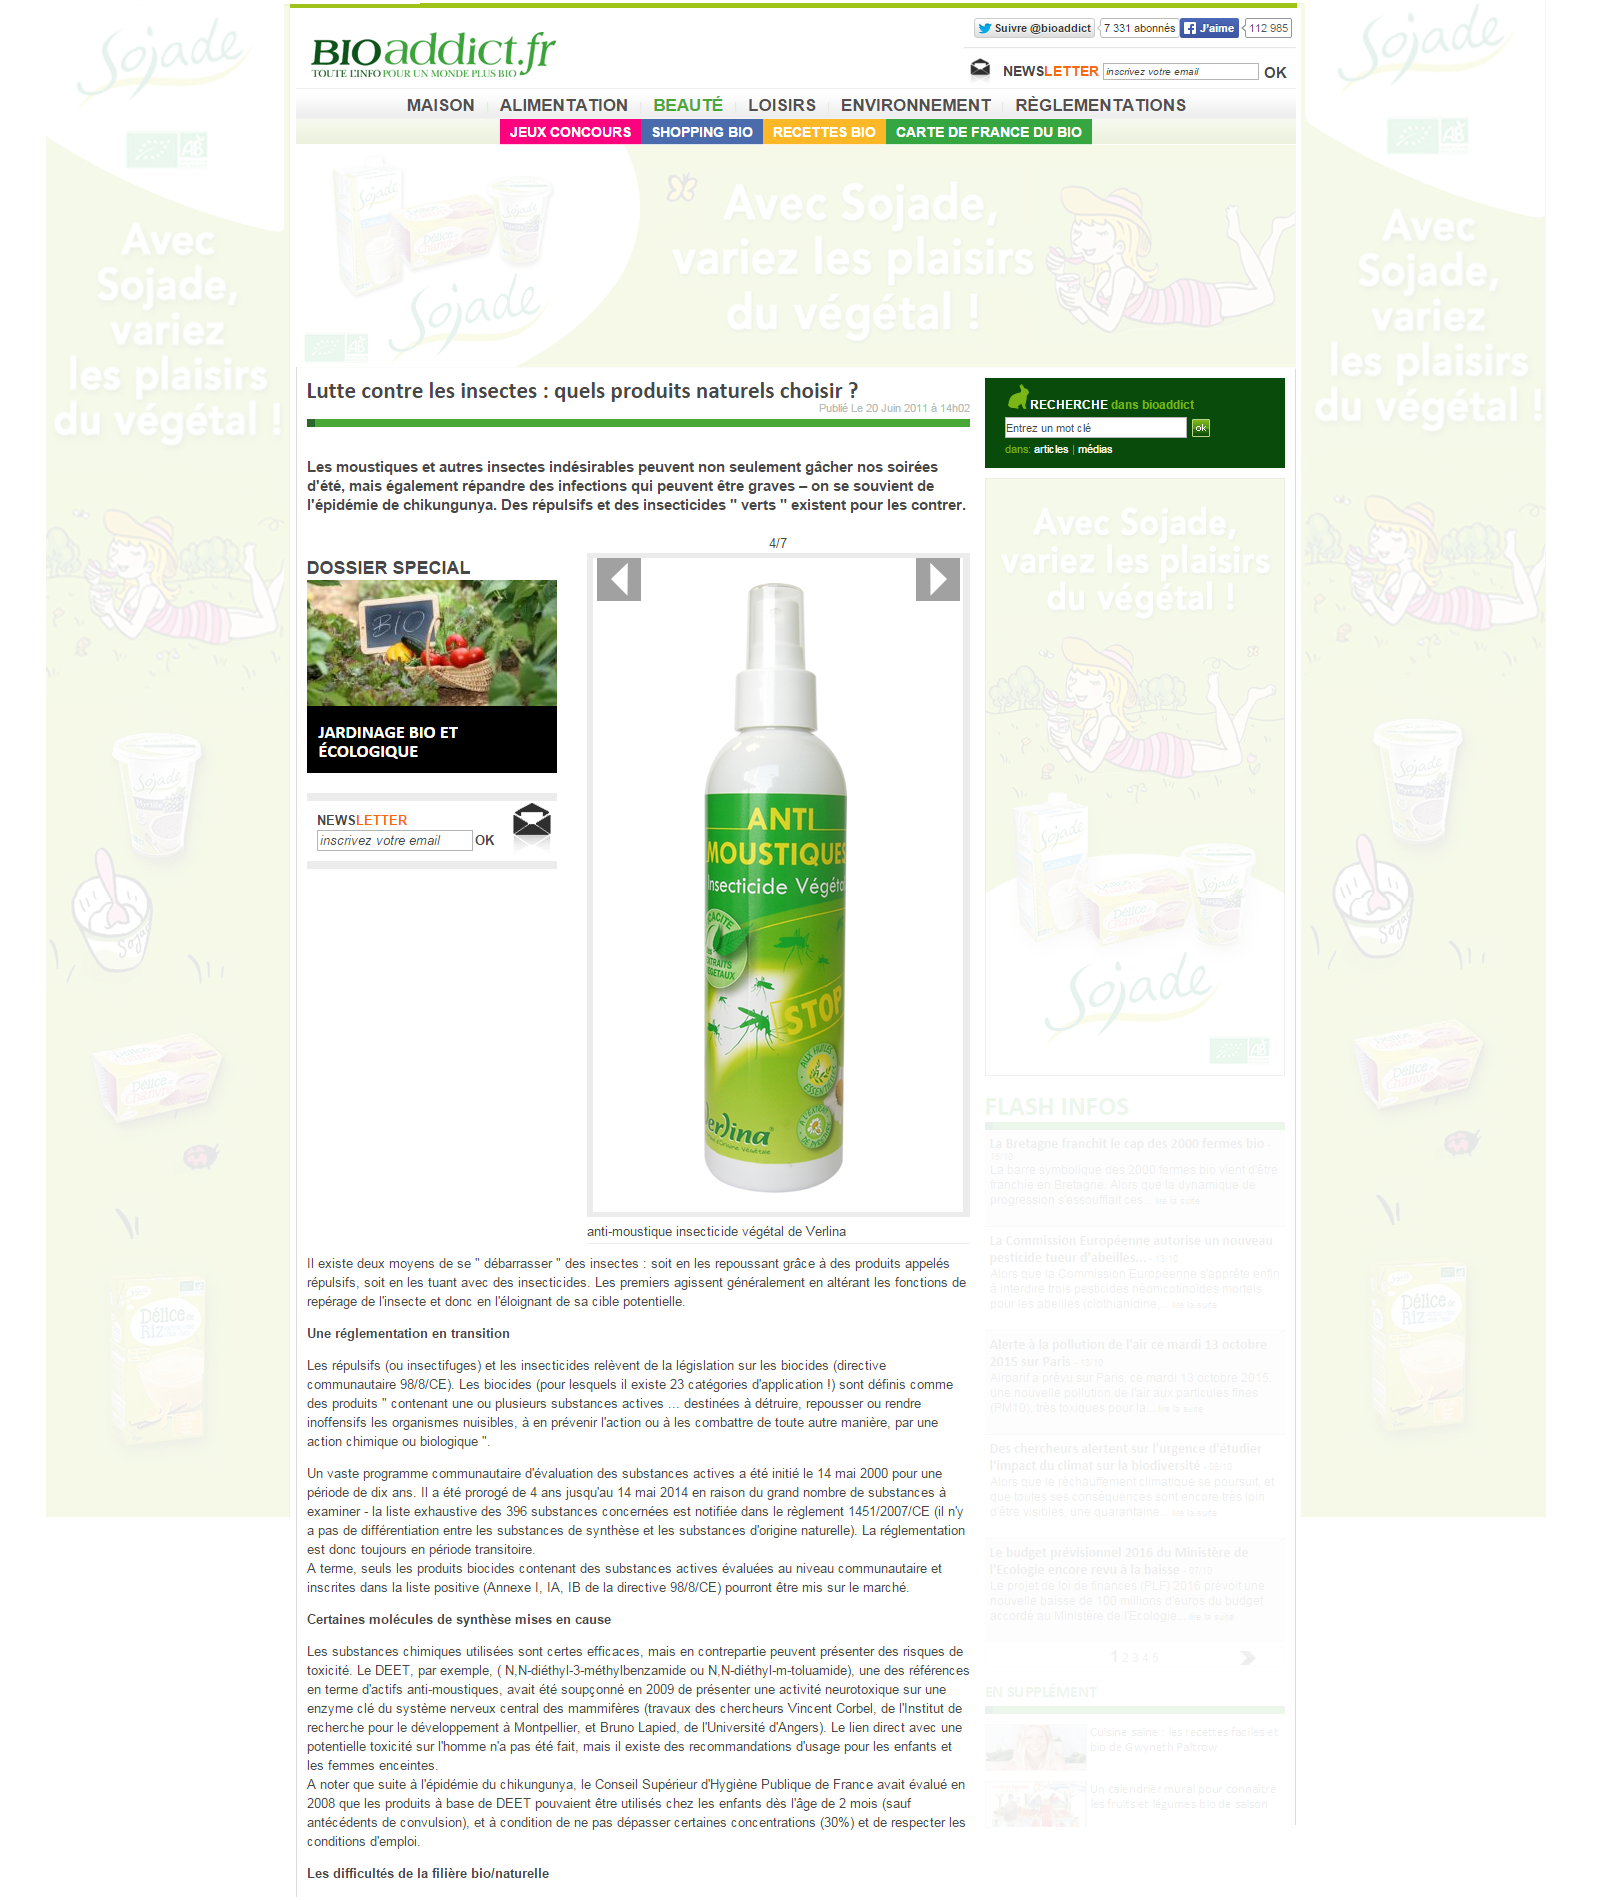 bioaddict-anti-moustiques-verlina